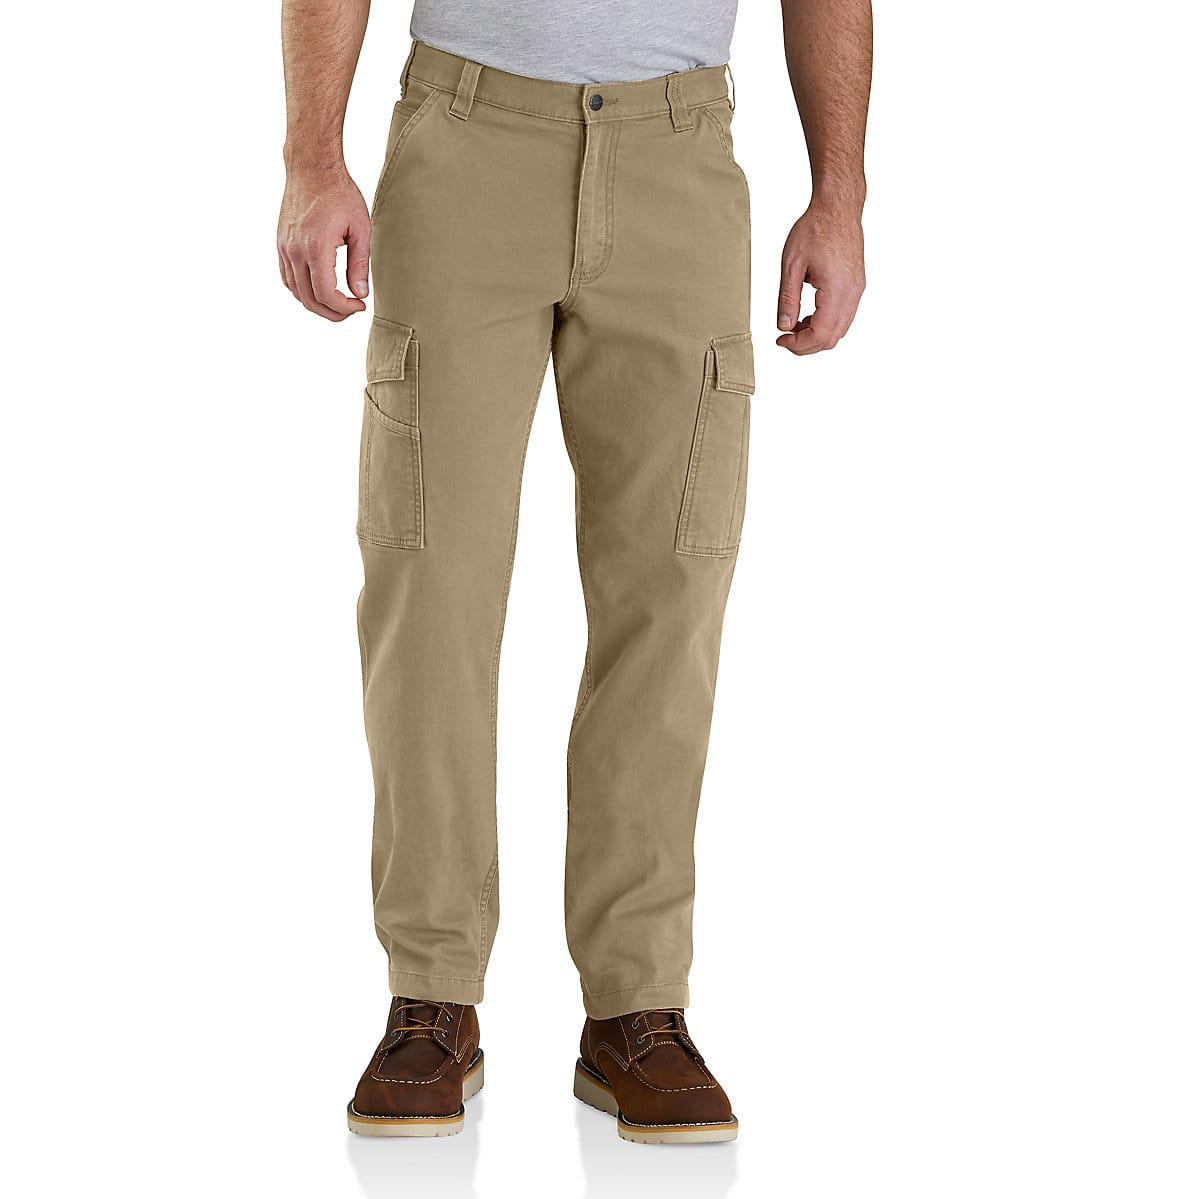 a0033fc4859c99 Men's Rugged Flex® Rigby Cargo Pant 103574   Carhartt